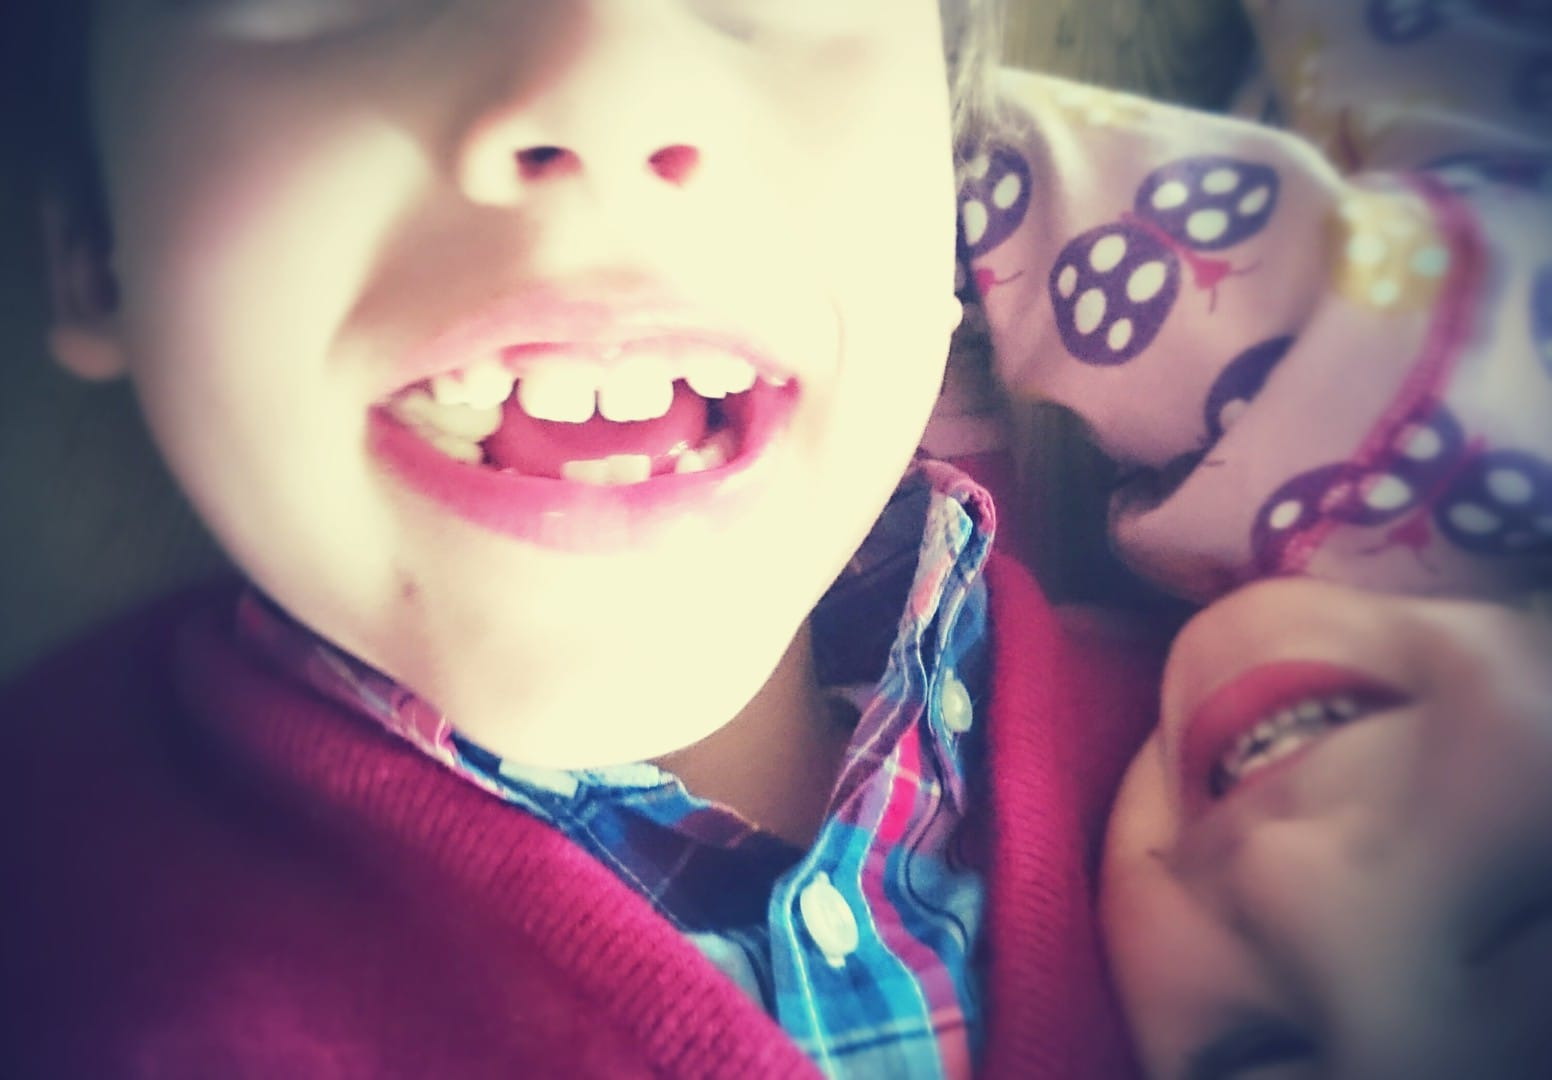 Kinderlachen Frau Mutter Blog